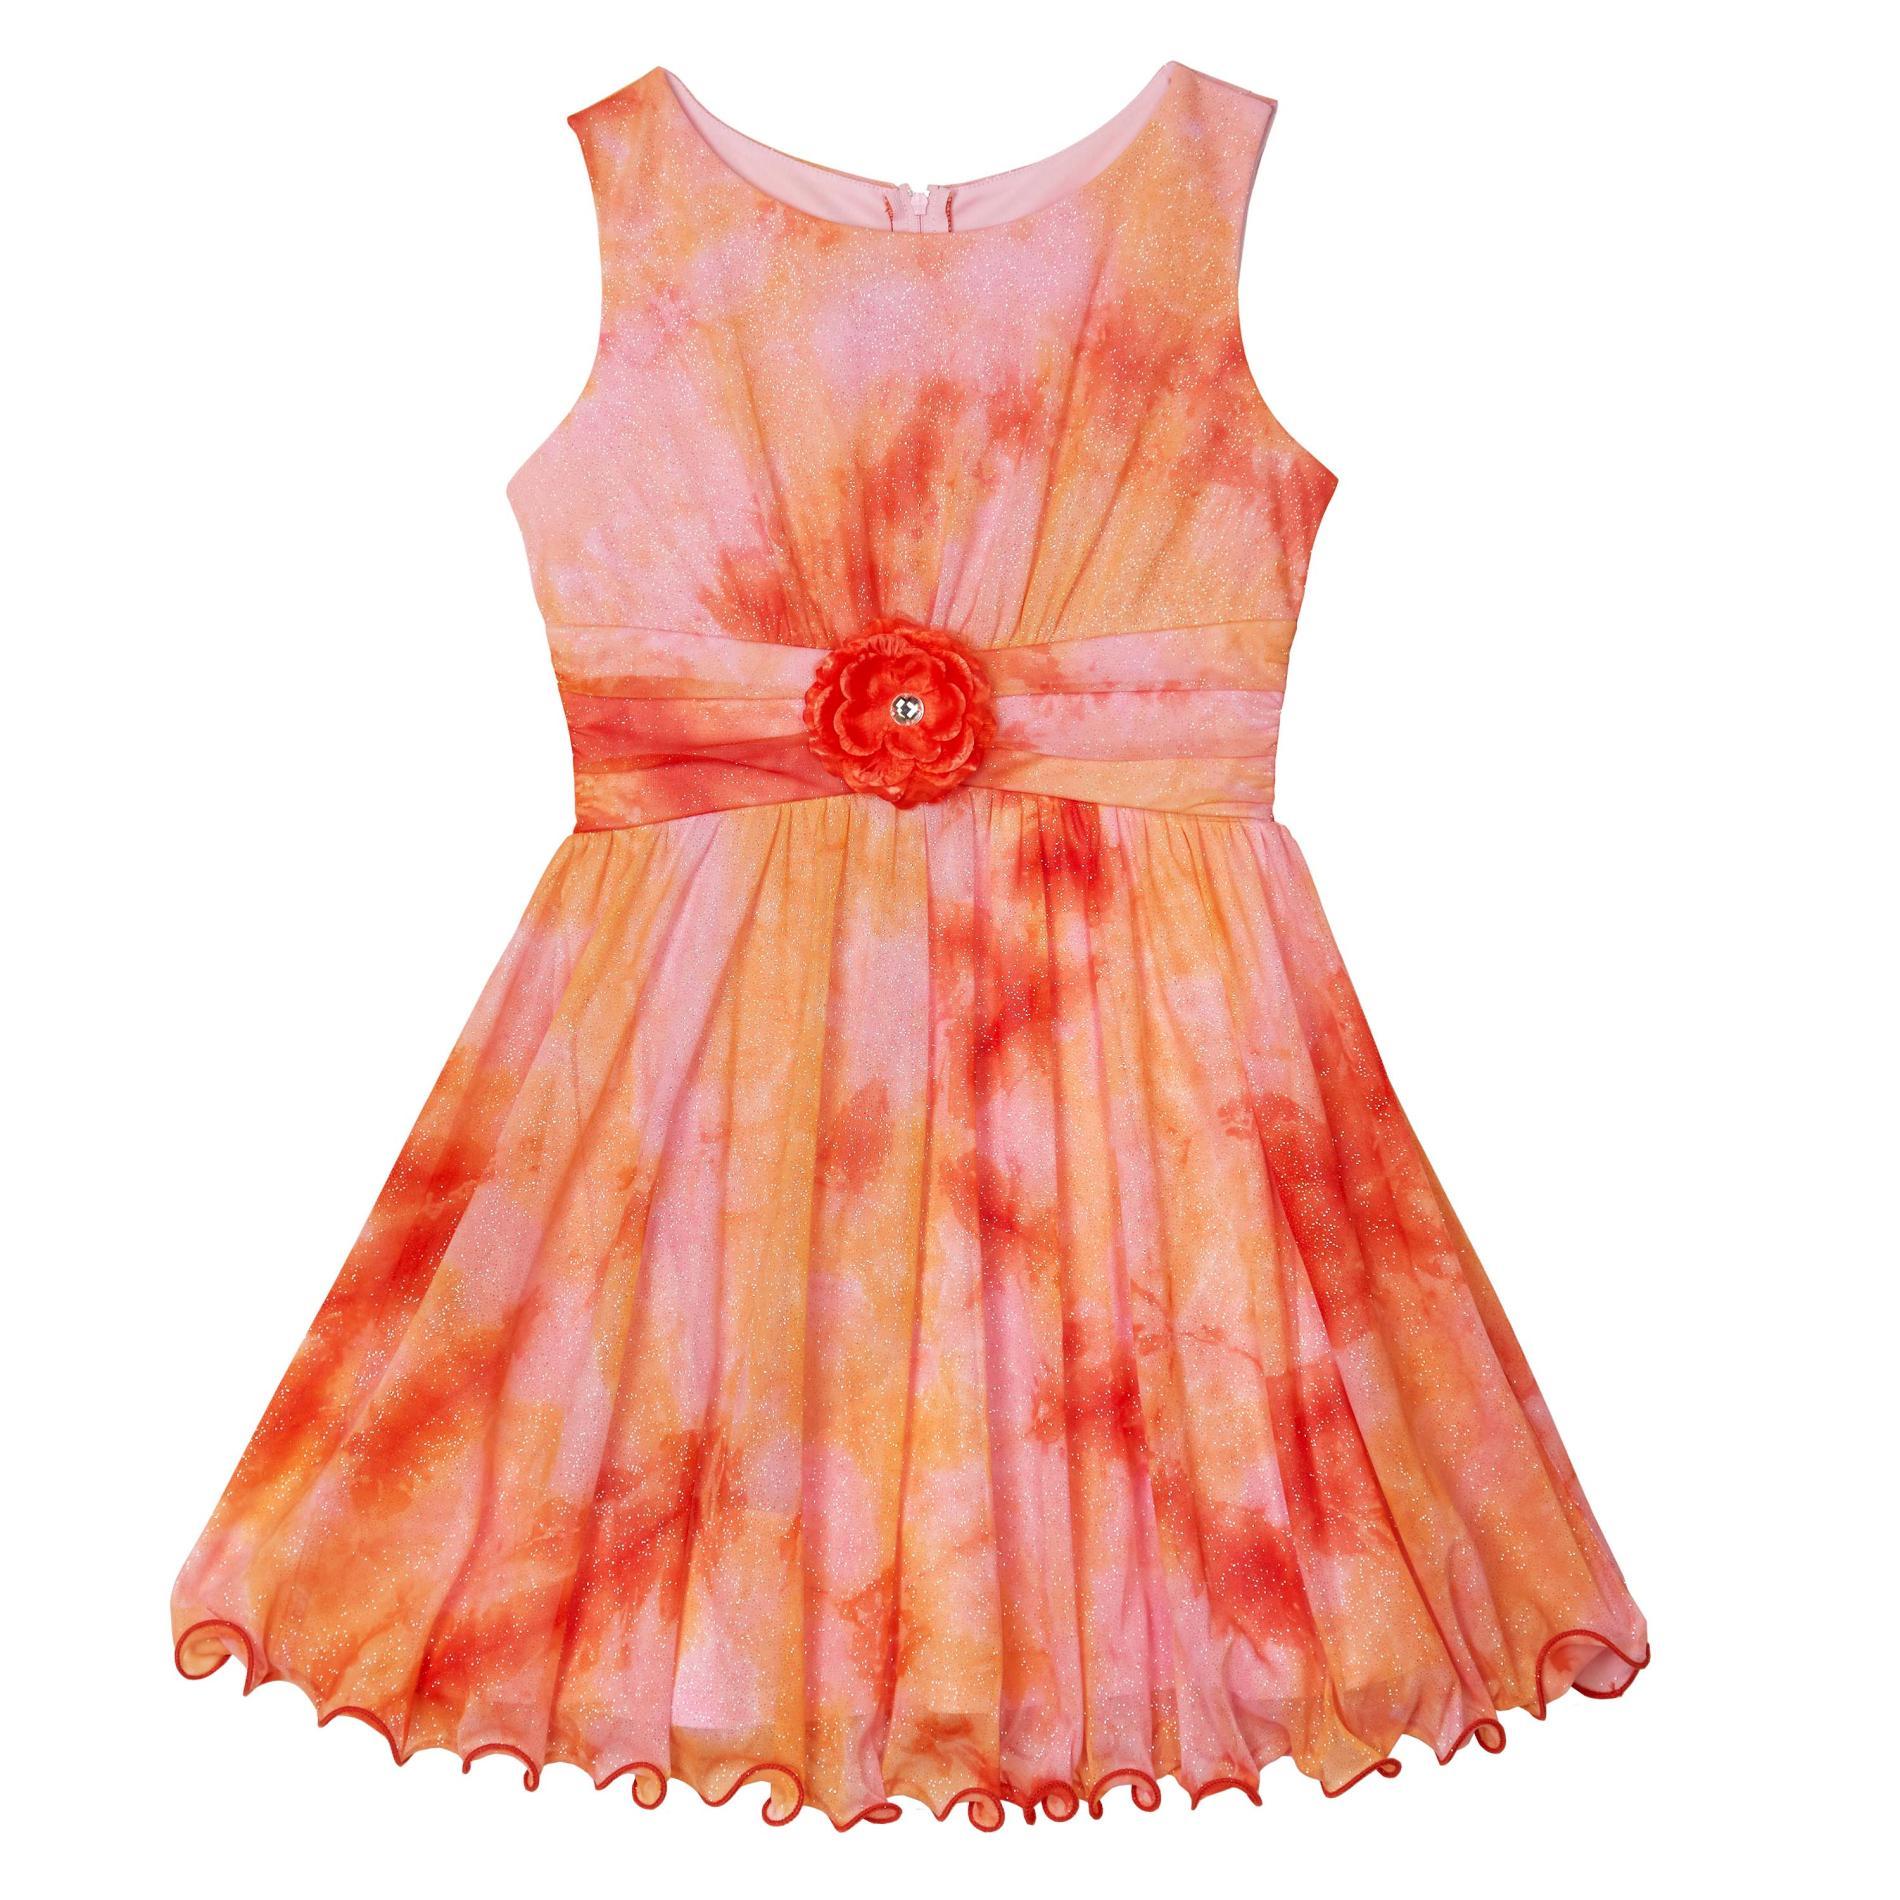 Amy's Closet Girl's Pleated Dress - Tie-Dye